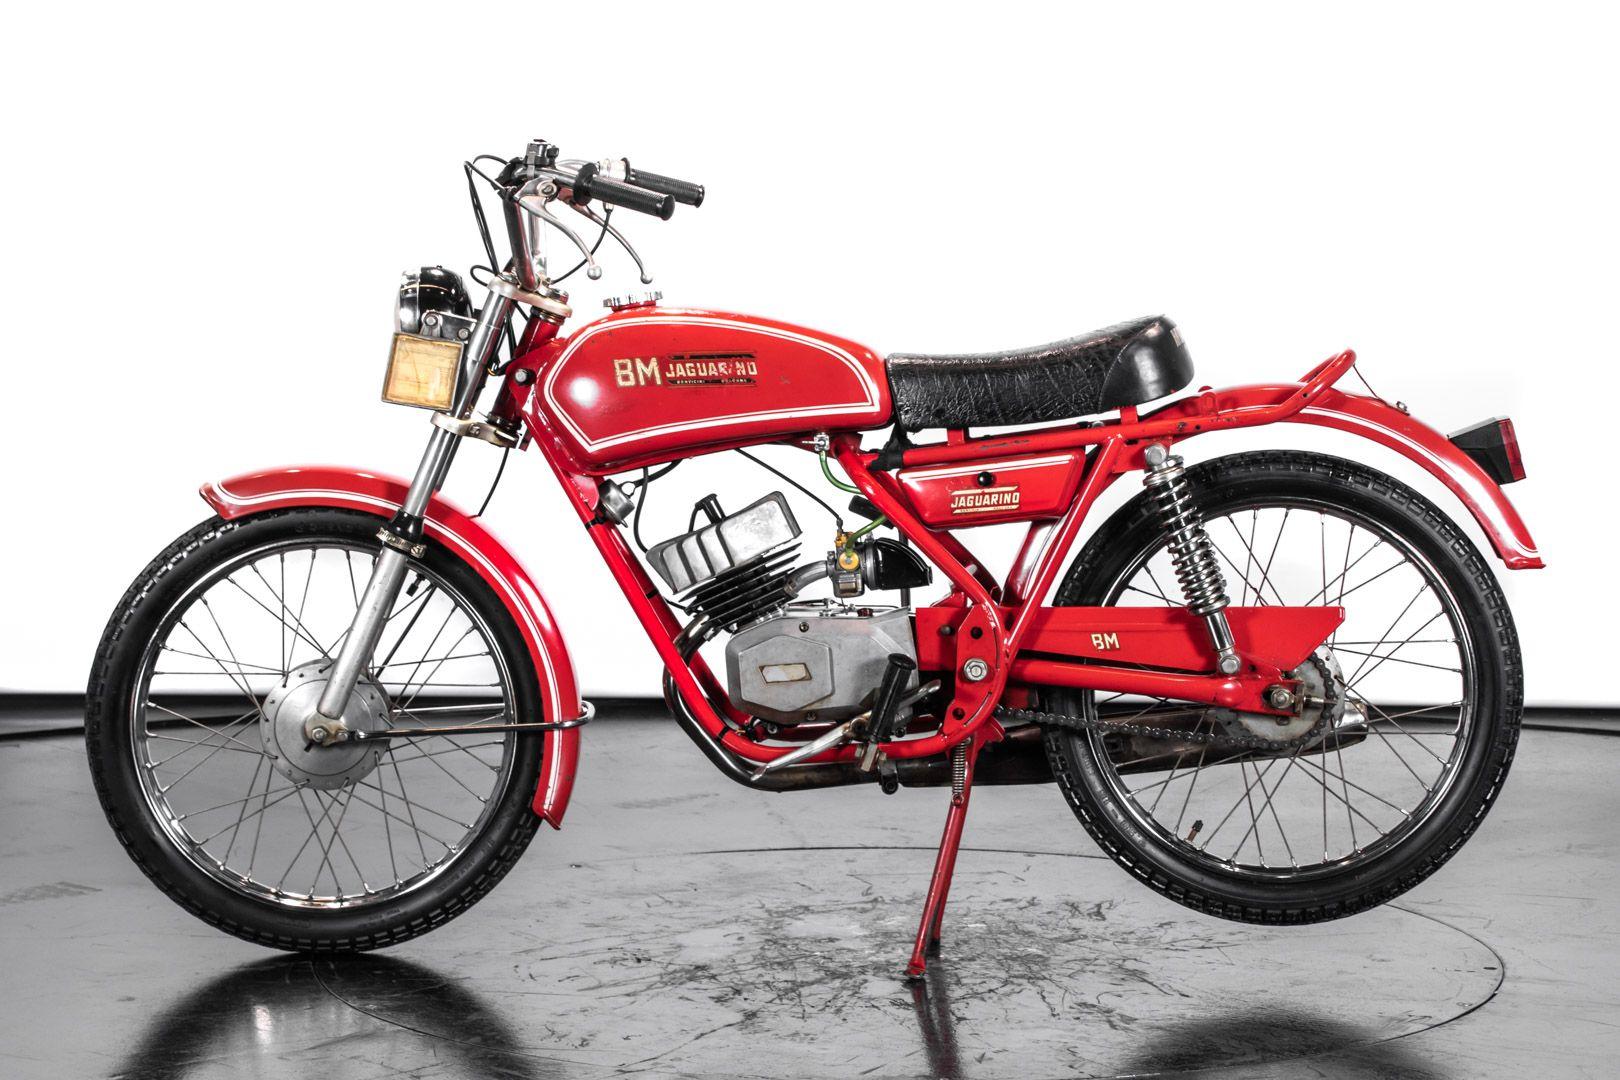 1978 Bonvicini Moto Jaguarino 50 82524